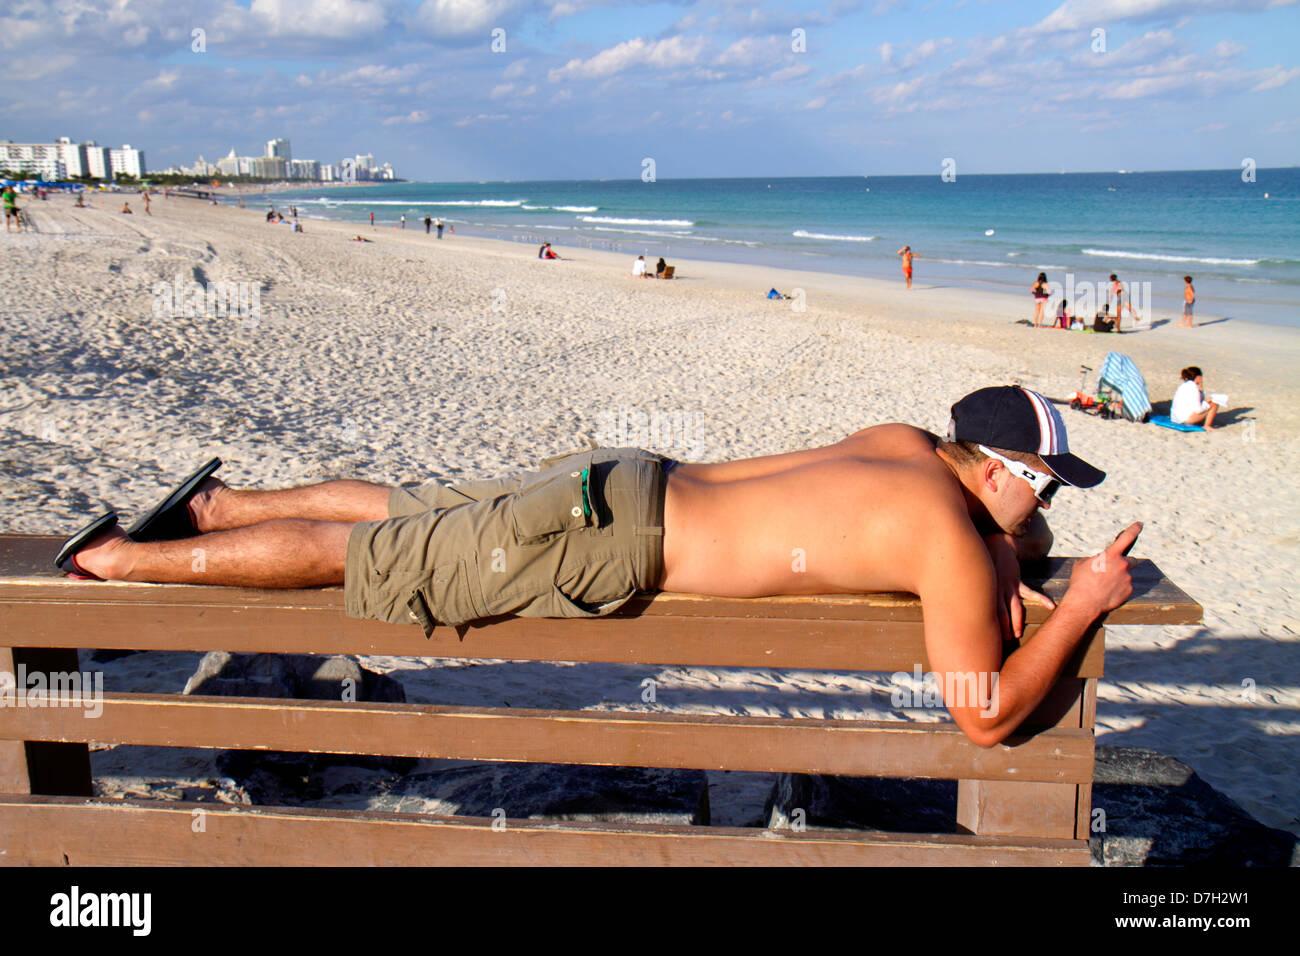 Man Sunbathing In Park Stock Photos  Man Sunbathing In -4507